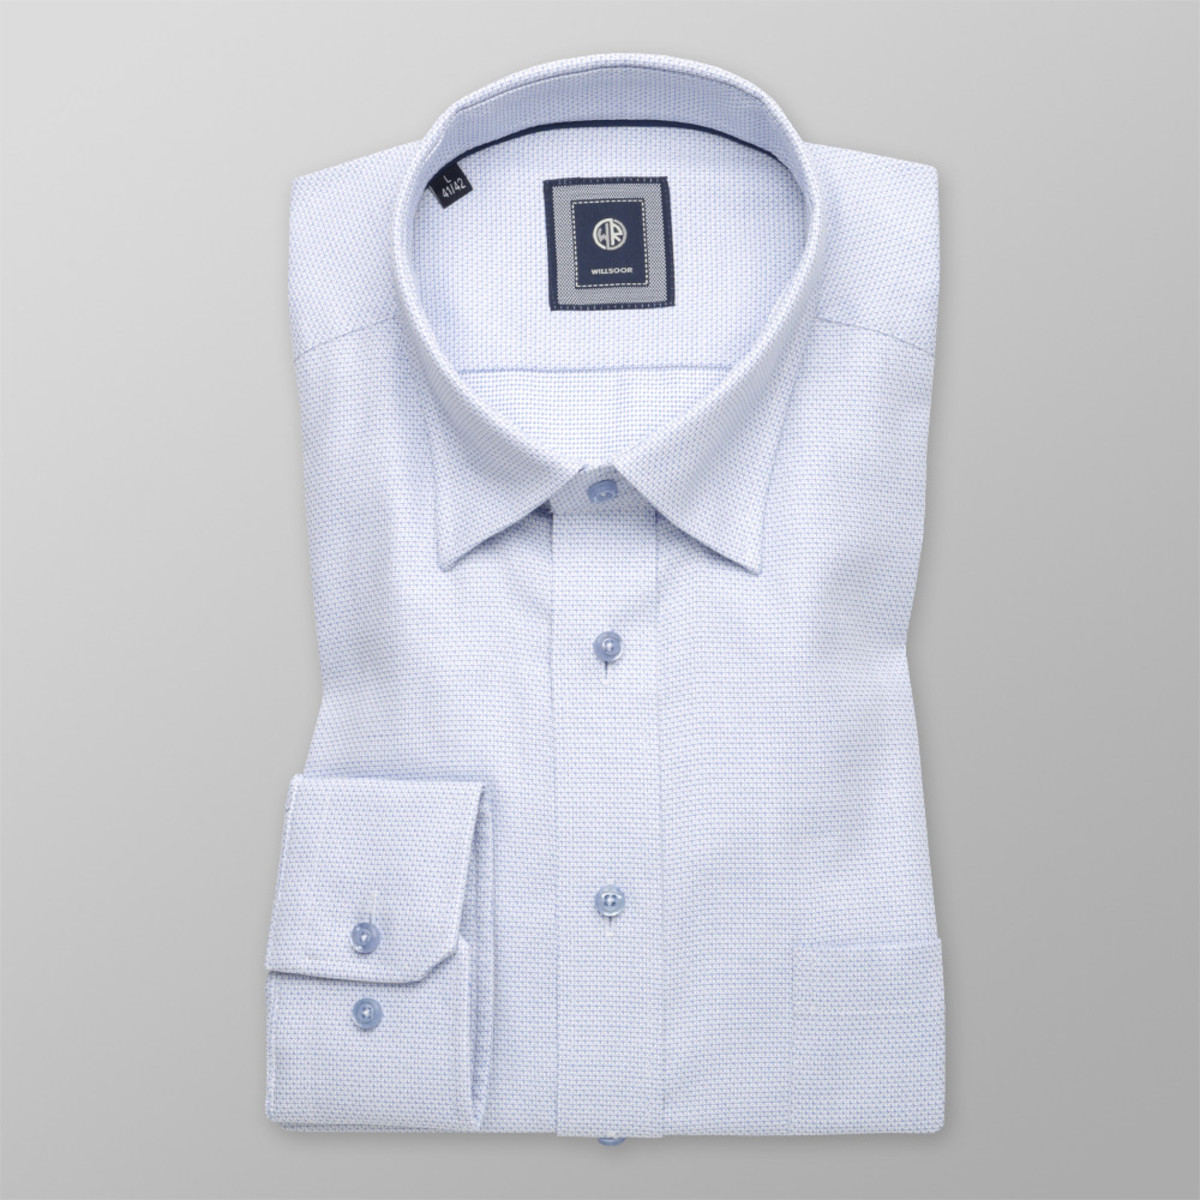 Košile London jemný modrý vzor (výška 176-182) 10233 176-182 / XL (43/44)